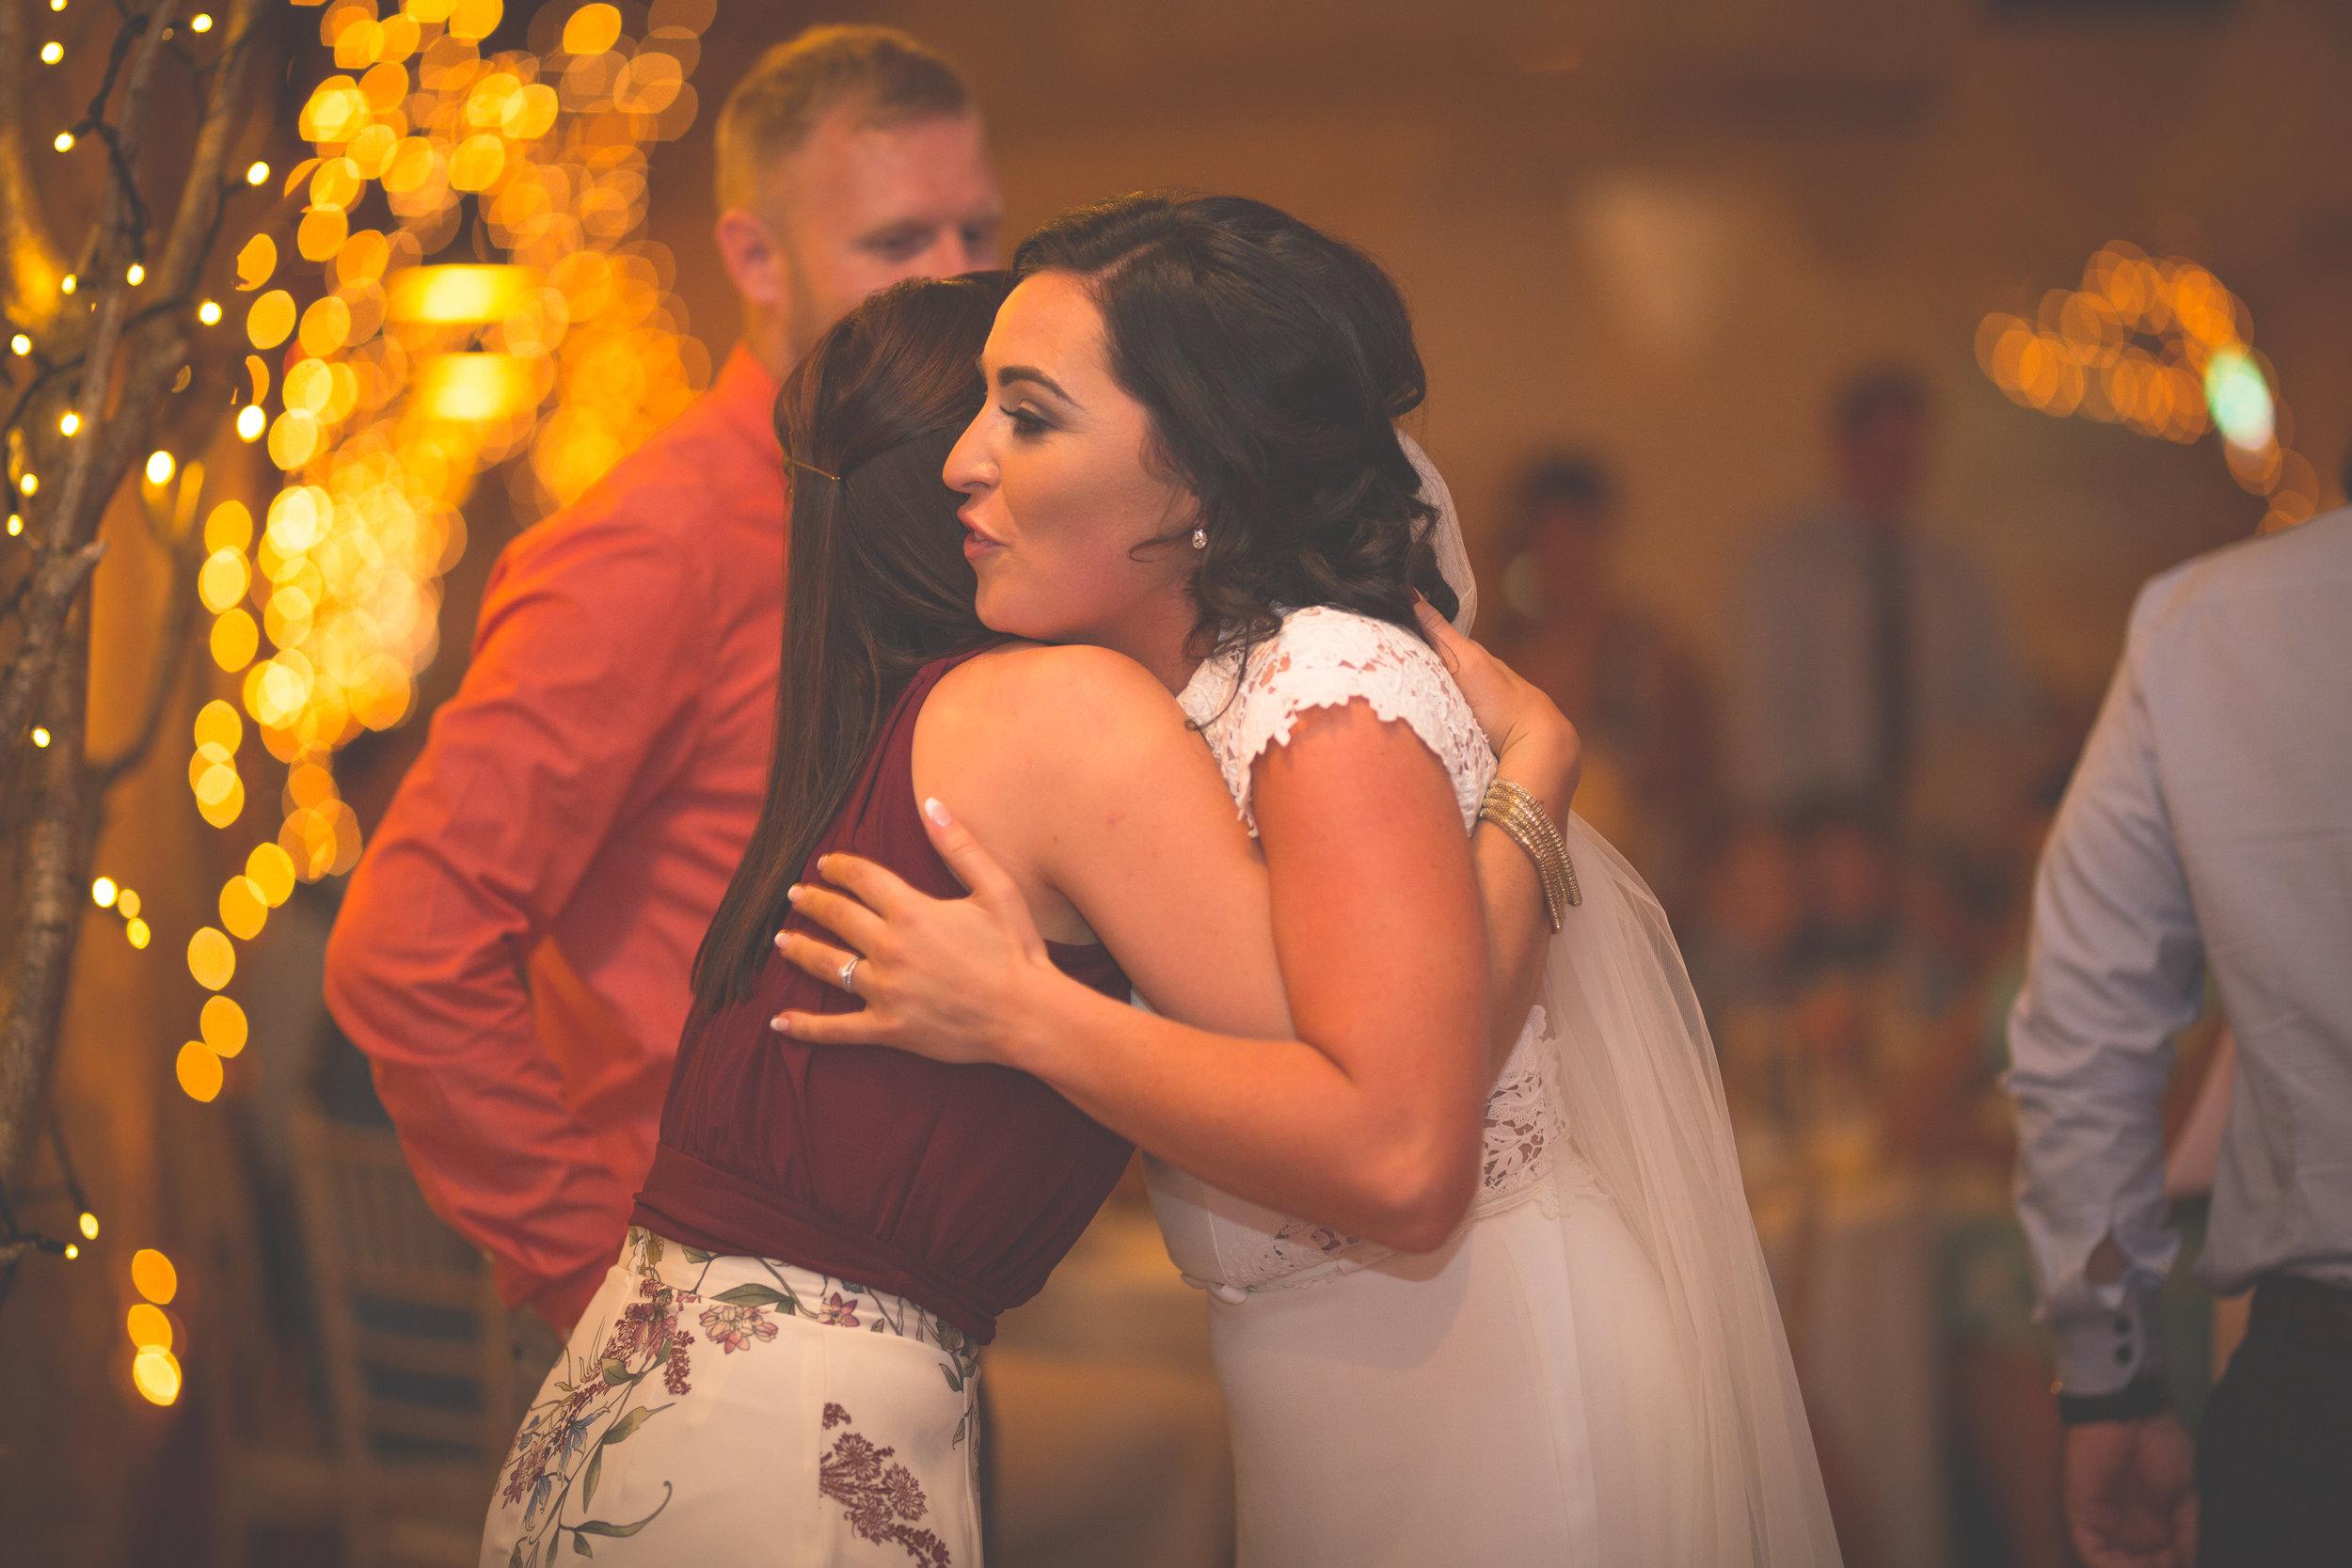 Brian McEwan Wedding Photography | Carol-Annee & Sean | The Dancing-77.jpg